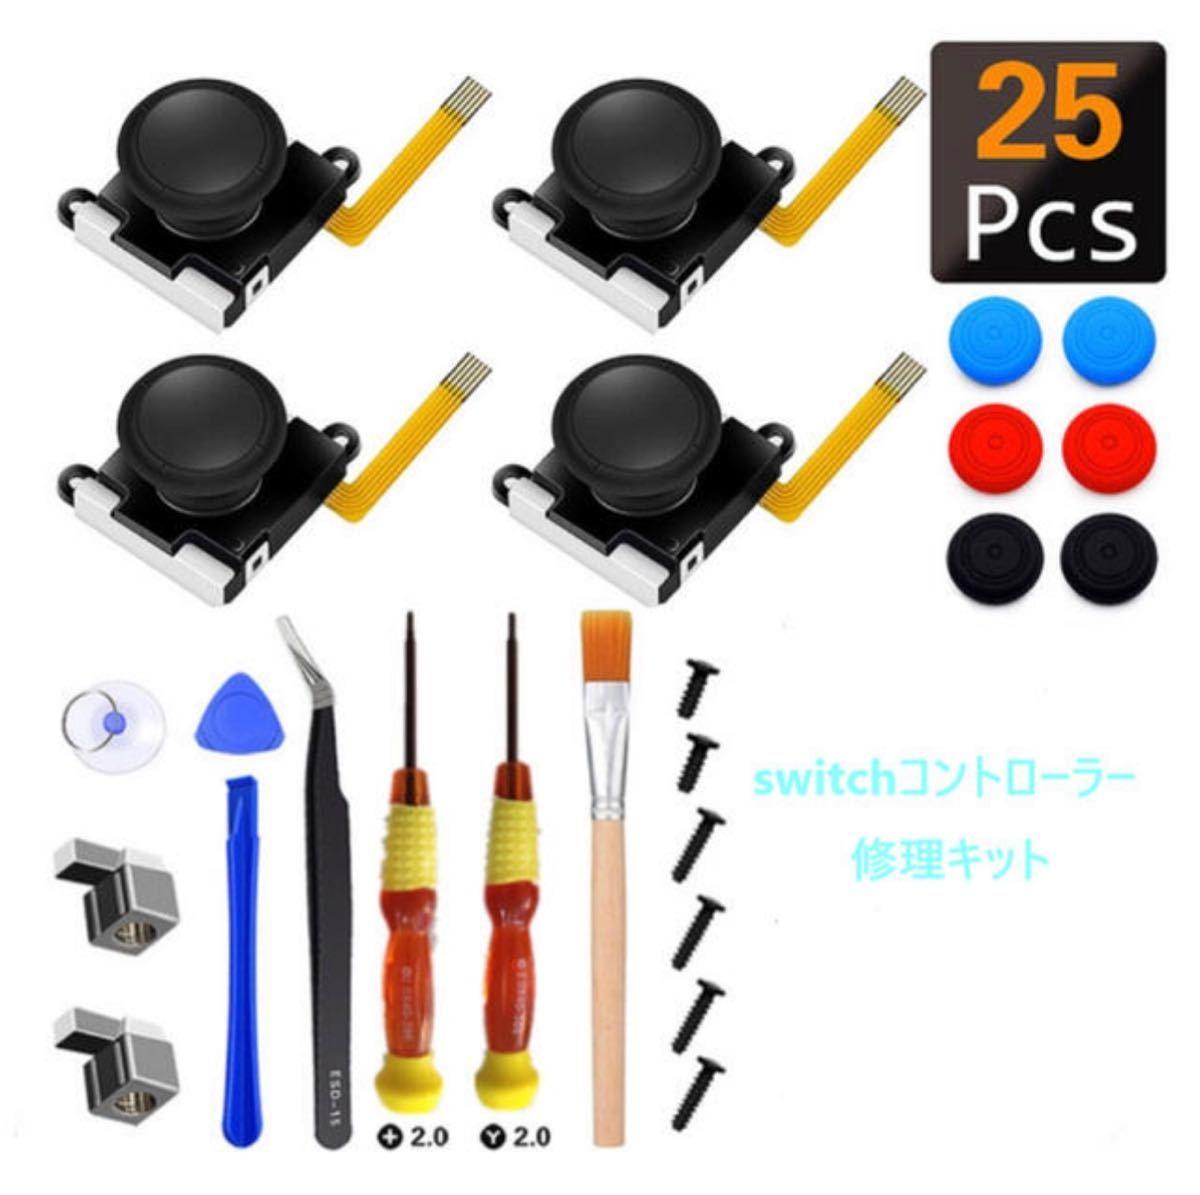 Switch Joy-con専用 修理キット